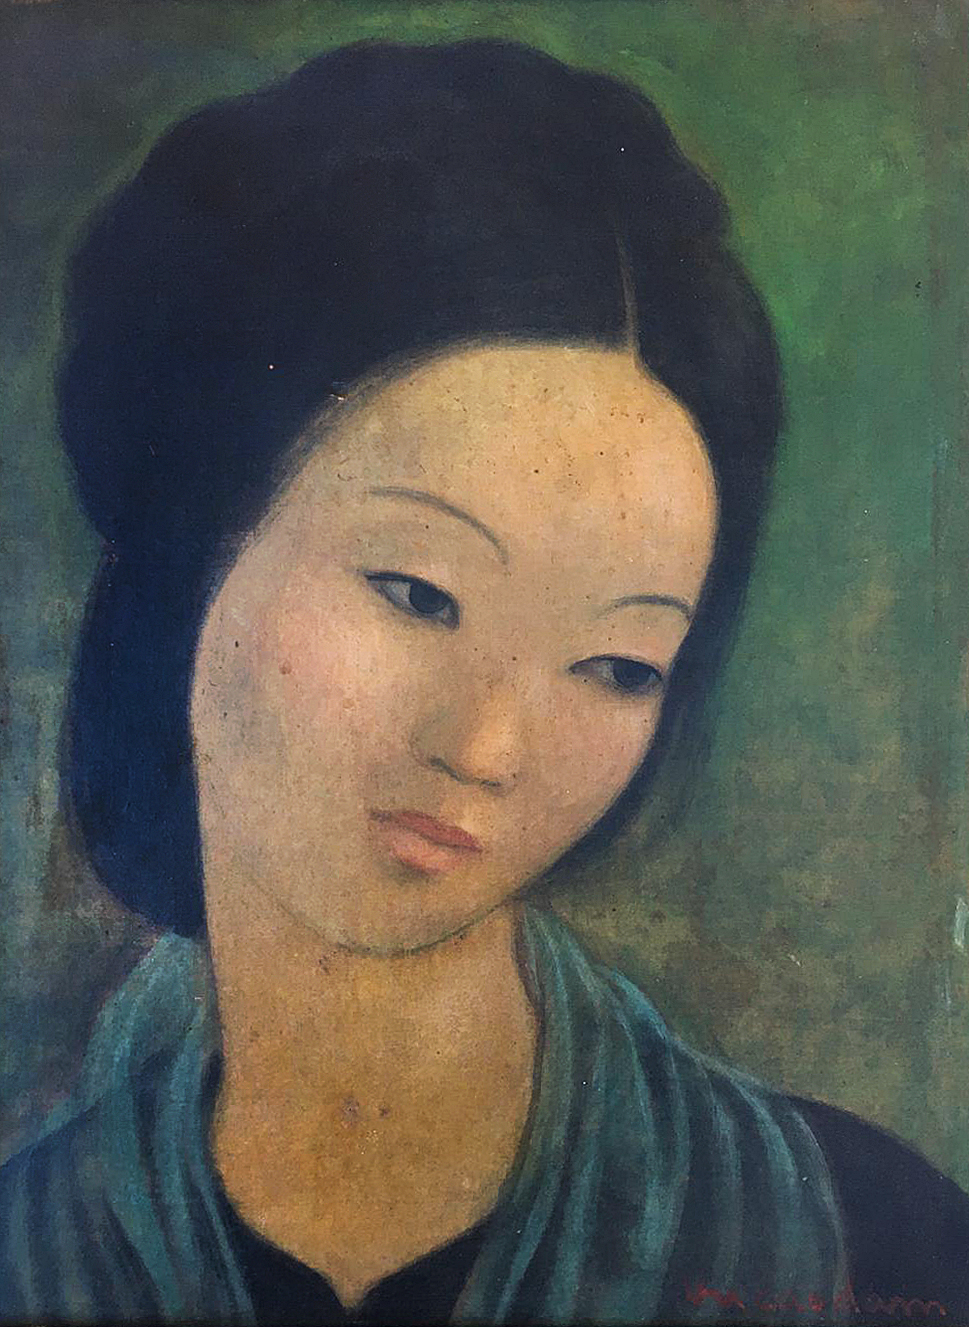 VU CAO DAM 武高谈 (1908-2000), INDOCHINA FINE ARTS COLLEGE, 7TH PROMOTION (1931)